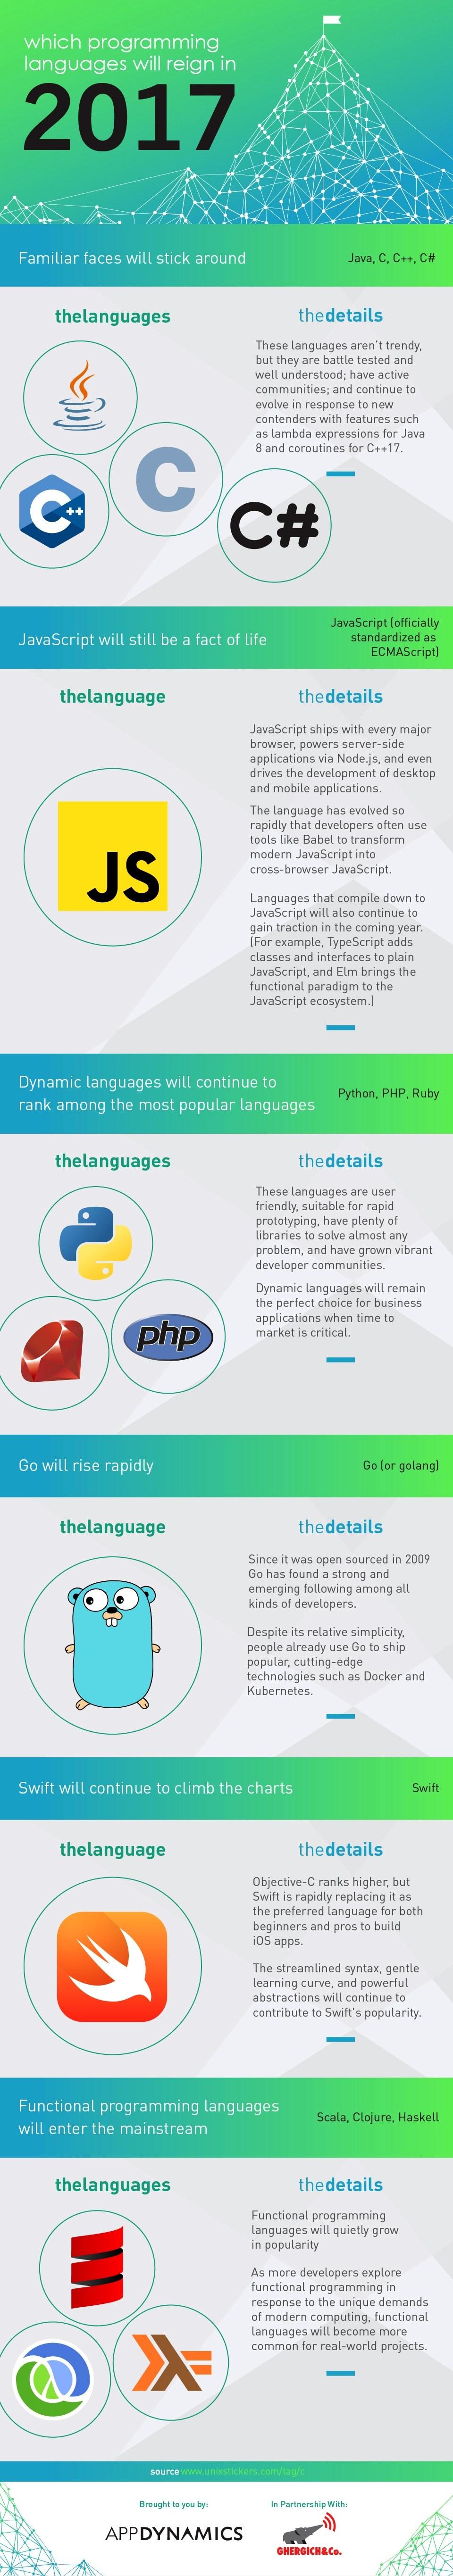 Latest Popular Programming Languages - Infographic